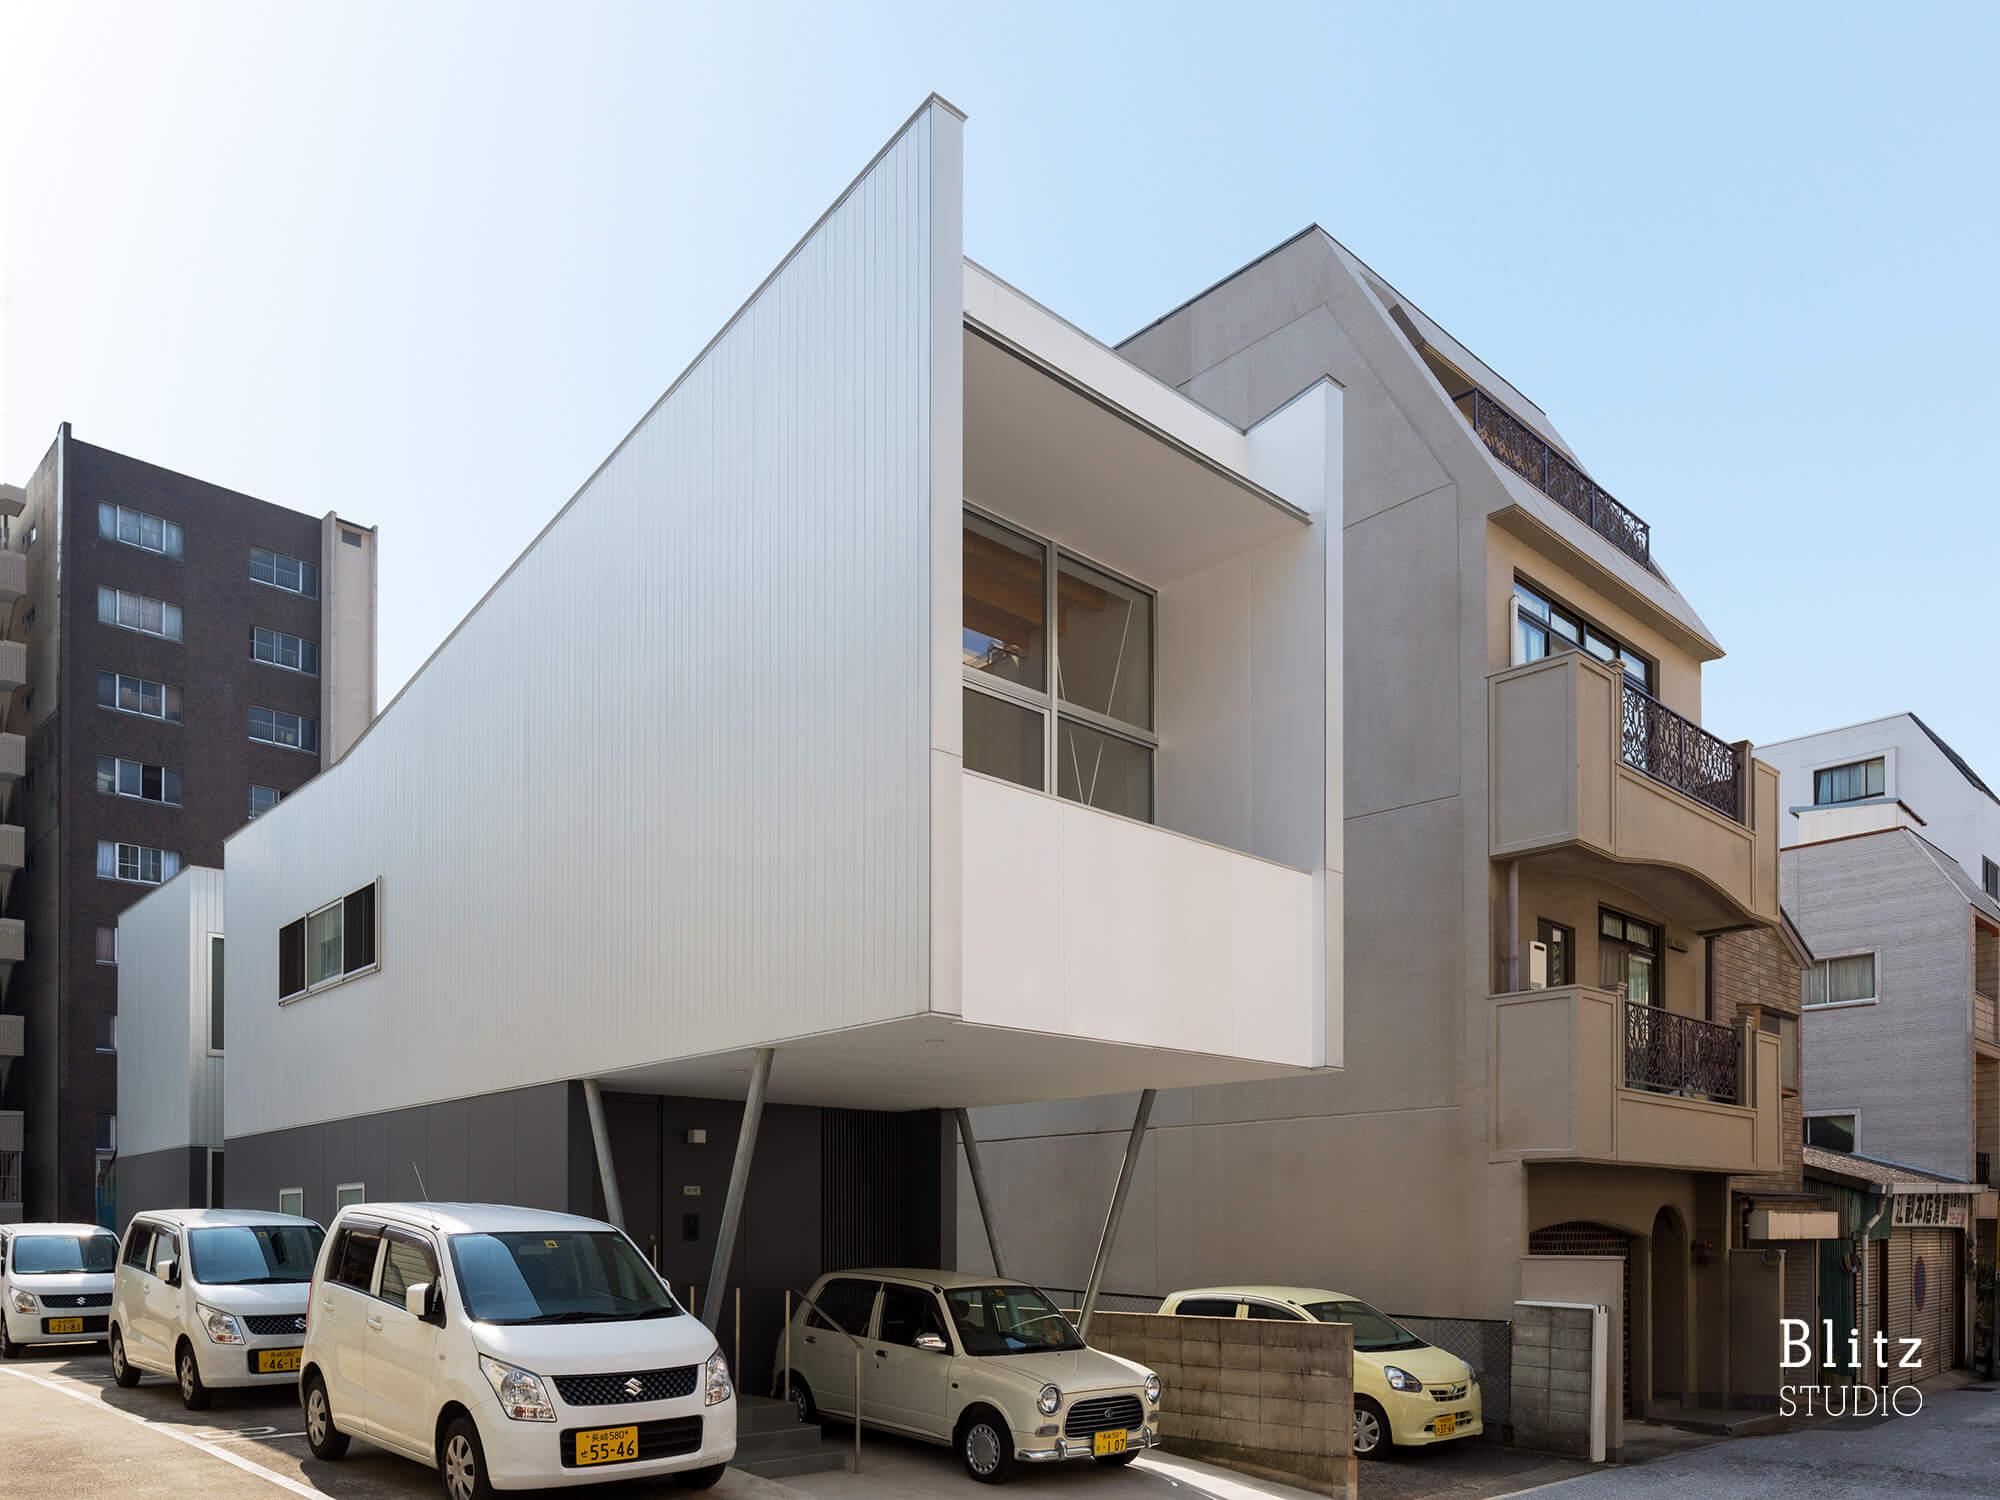 『油屋町の家』-長崎県長崎市-建築写真・竣工写真・インテリア写真4